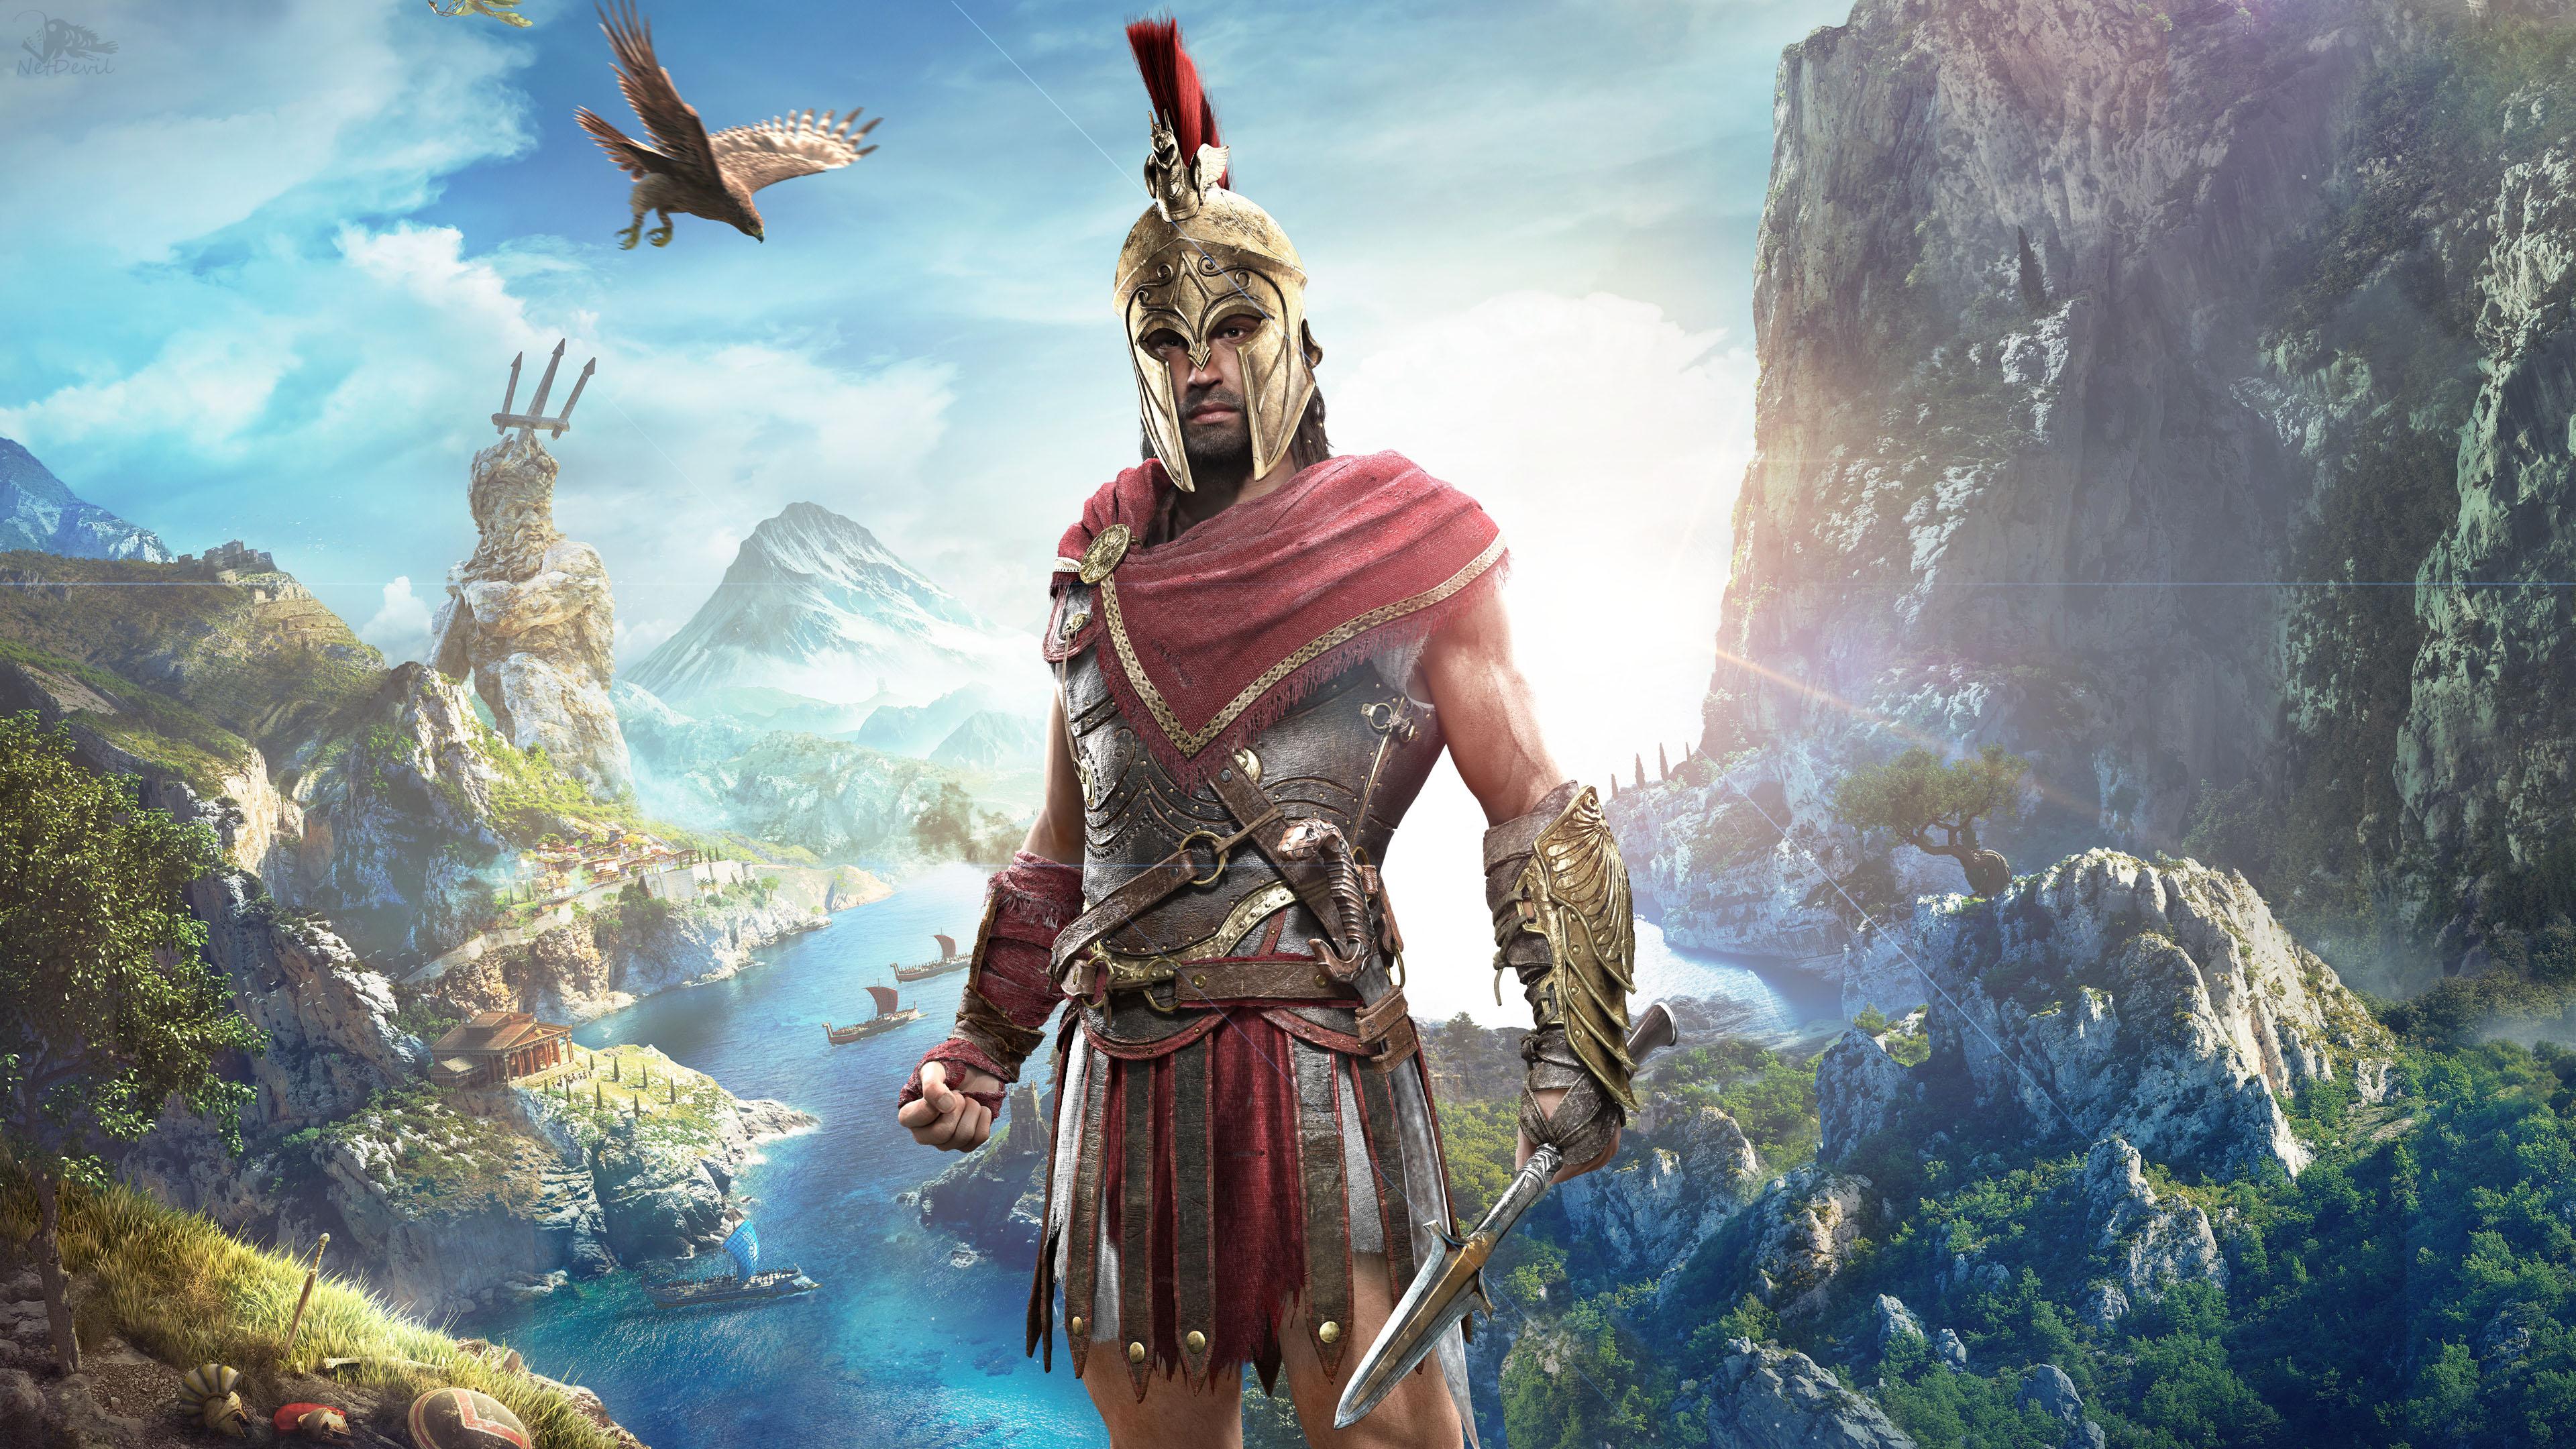 Hd Wallpapers Assassins Creed Assassin S Creed Odyssey 4k 8k Hd Wallpaper 2